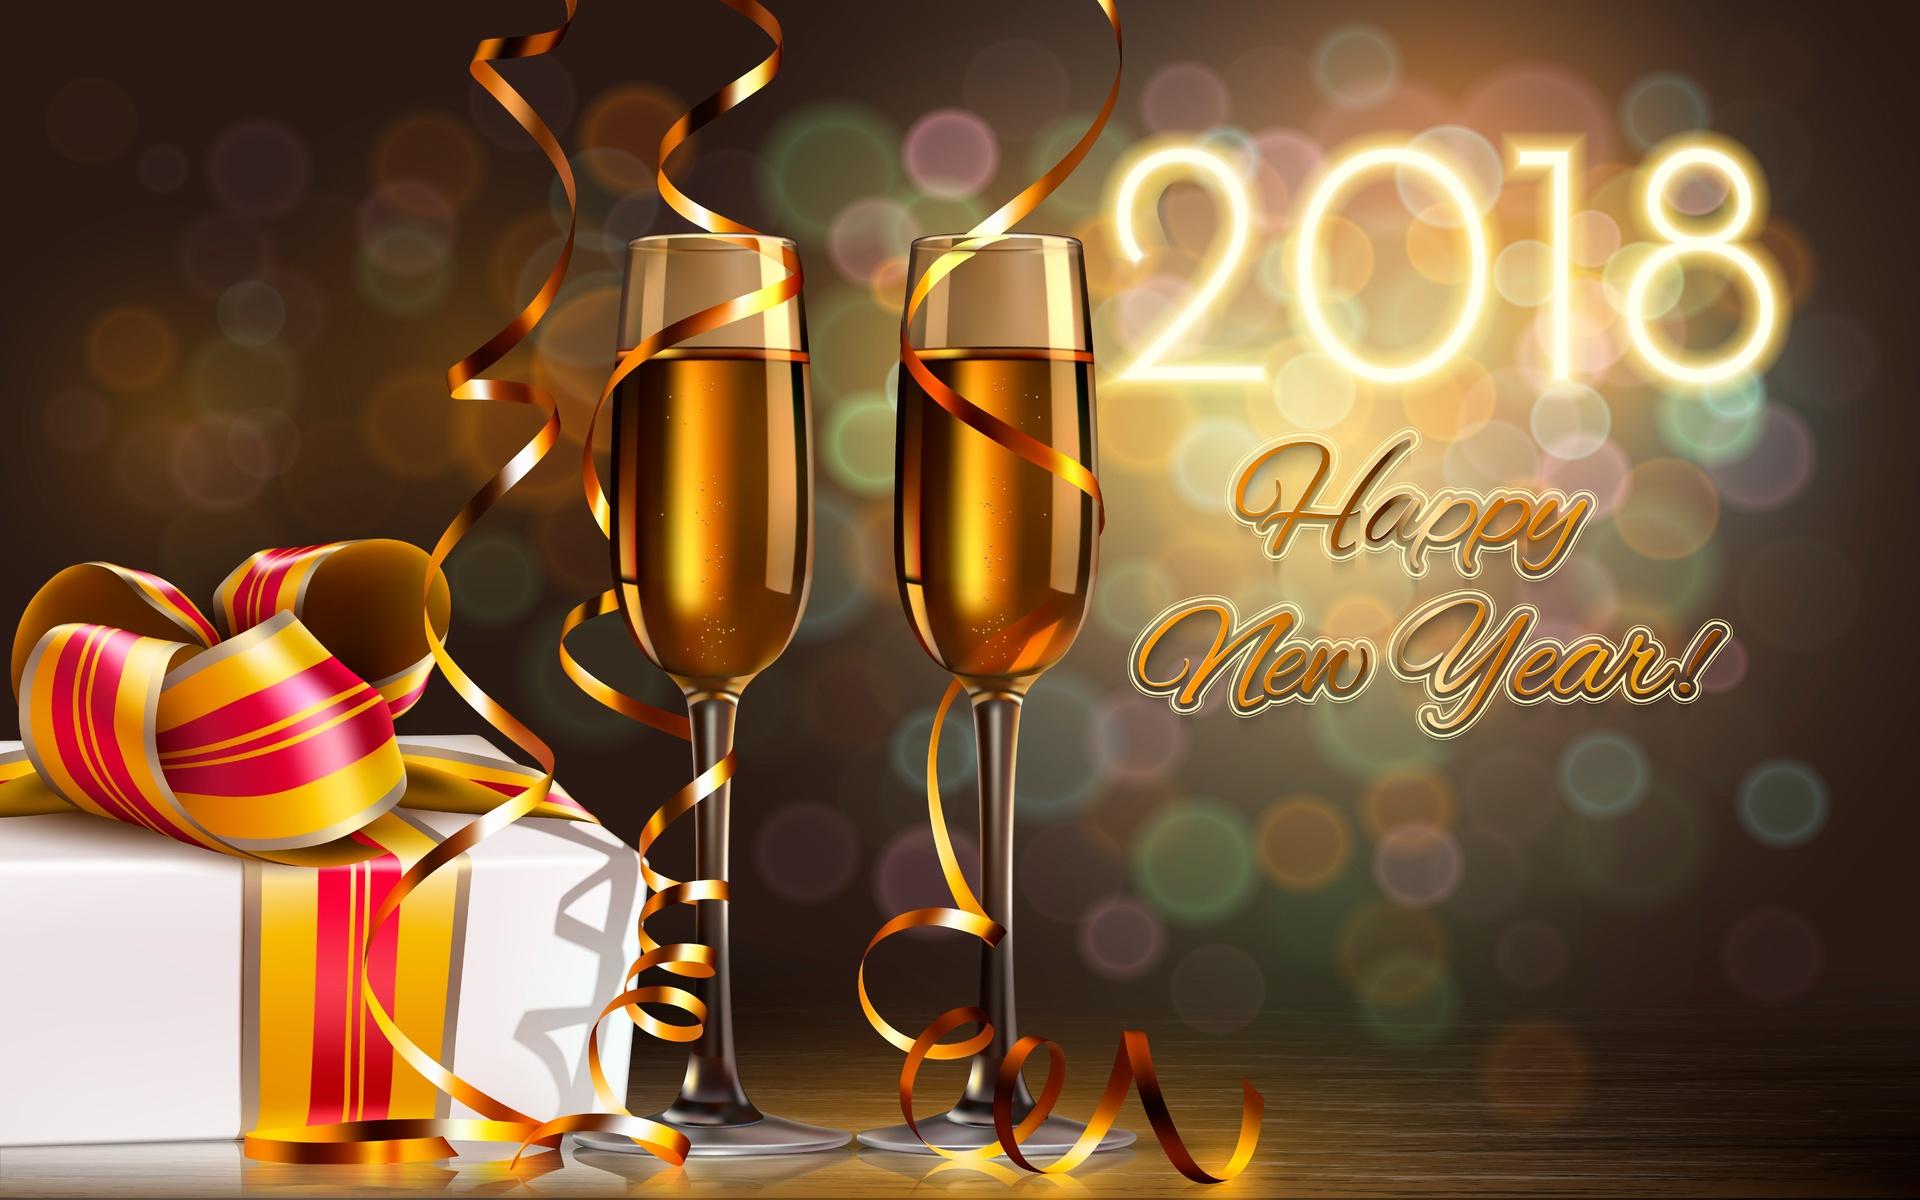 графика, праздник, новый год, коробка, подарок, бокалы, серпантин, боке, 2018, digital art